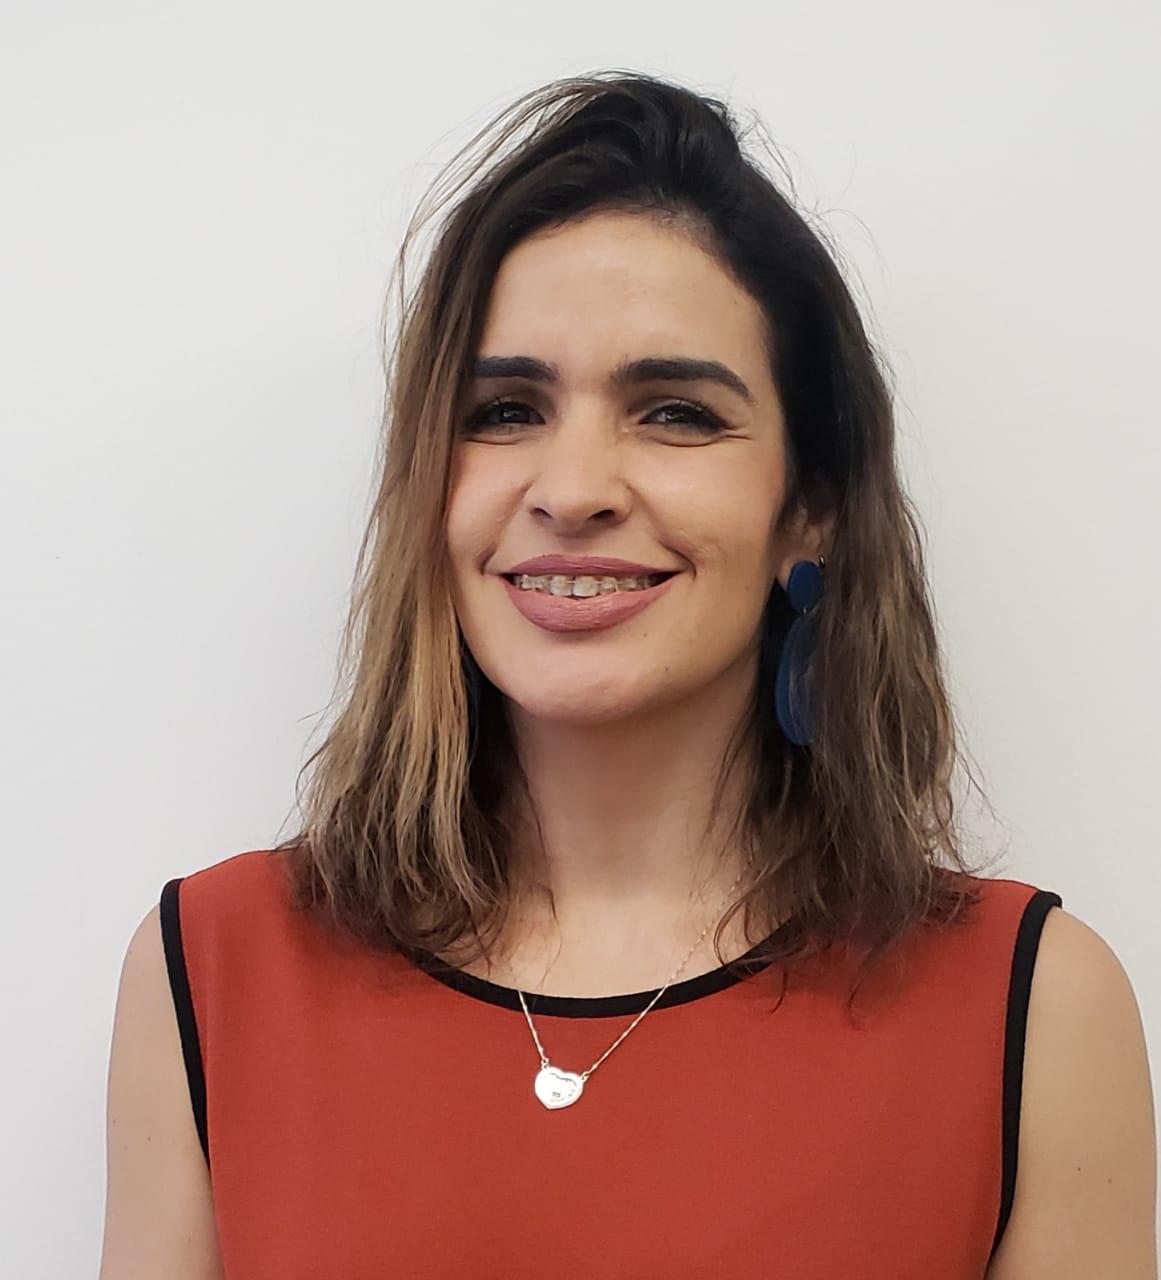 Maria Luiza Trindade